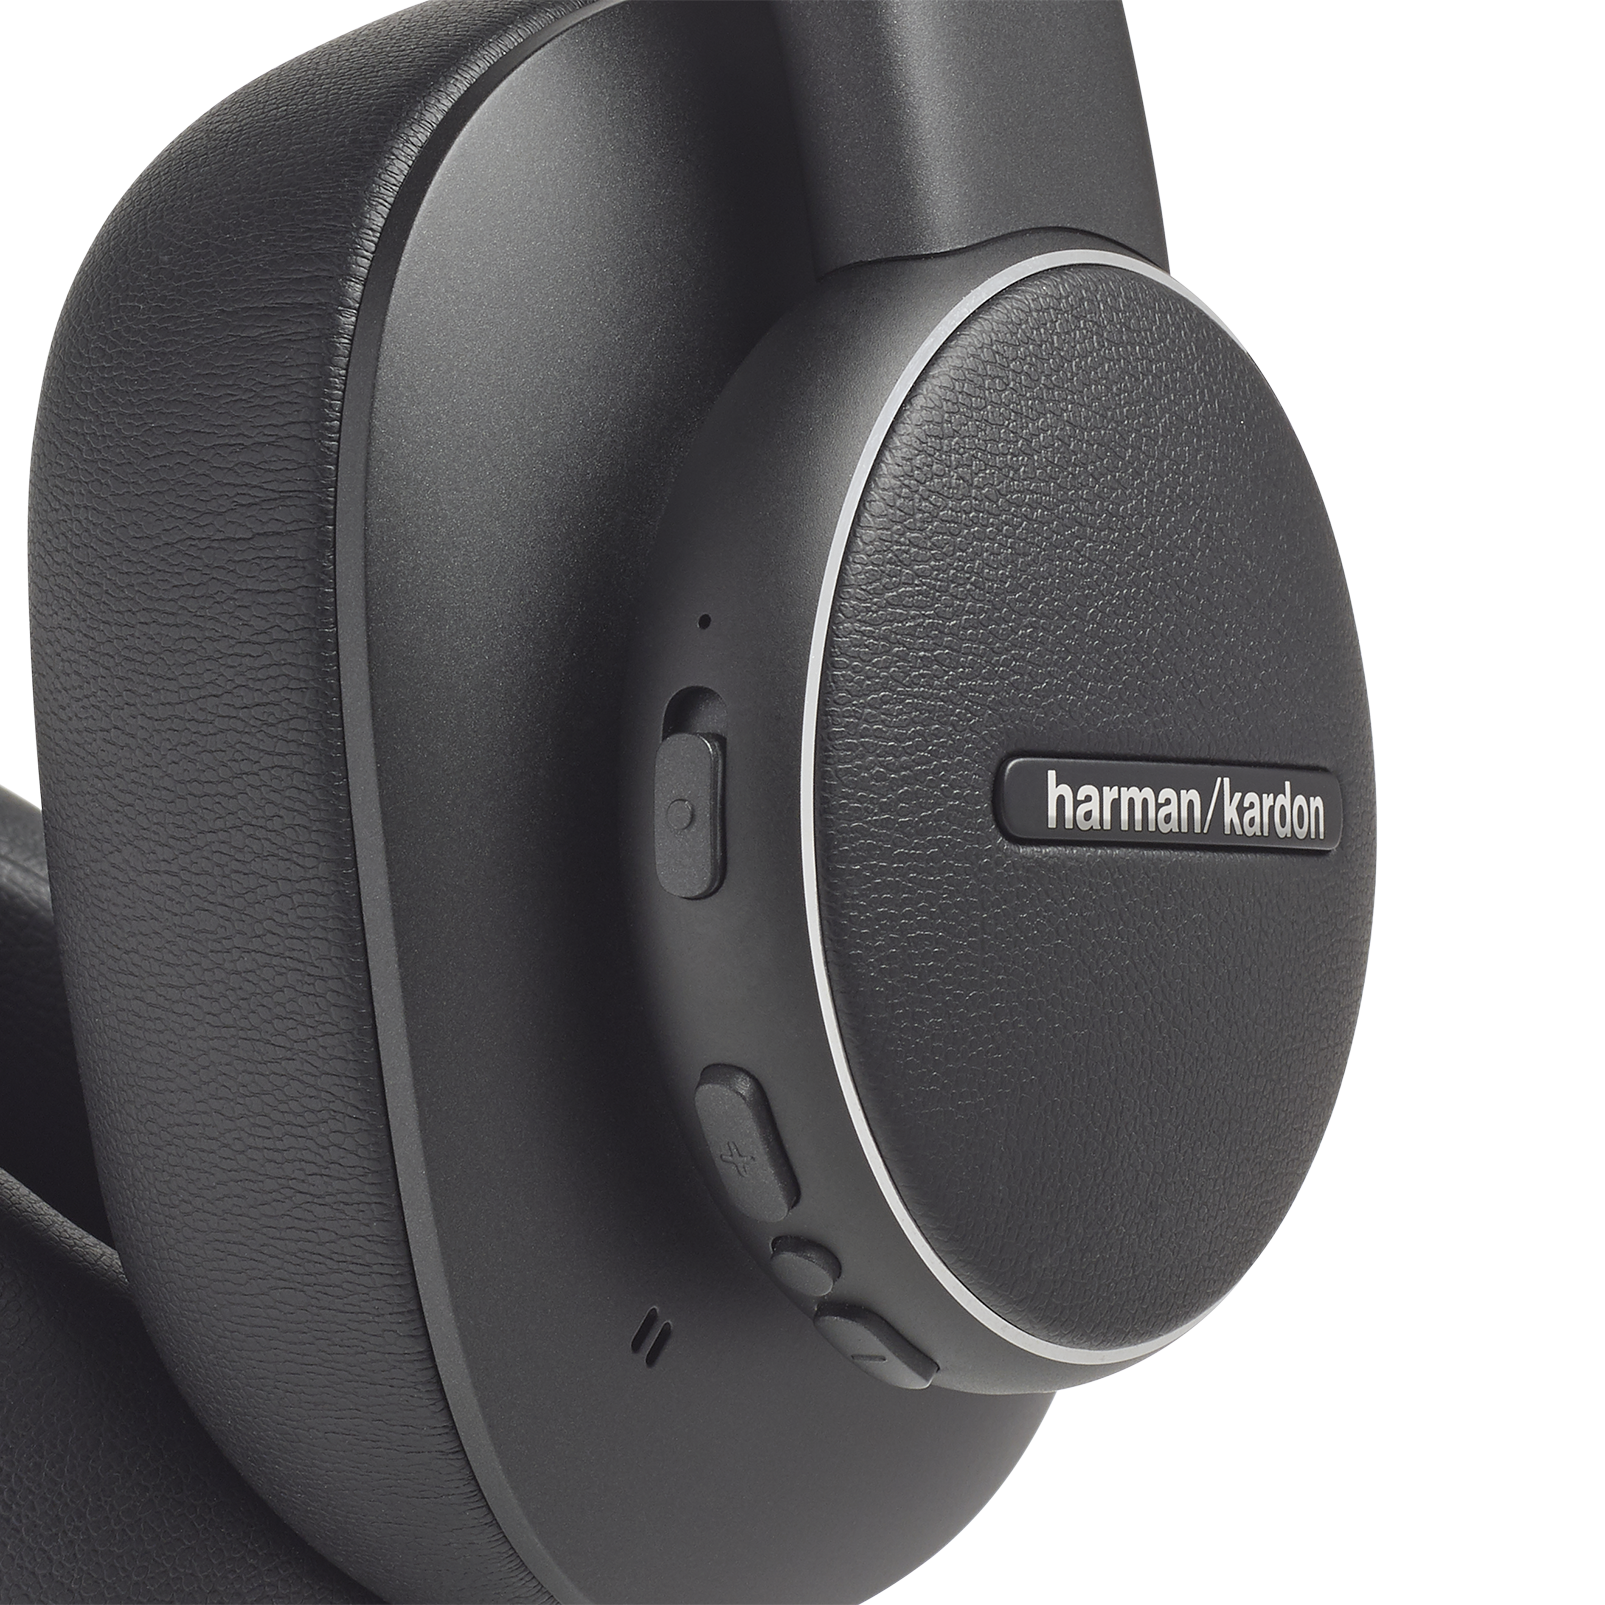 Harman Kardon FLY ANC - Black - Wireless Over-Ear NC Headphones - Detailshot 1